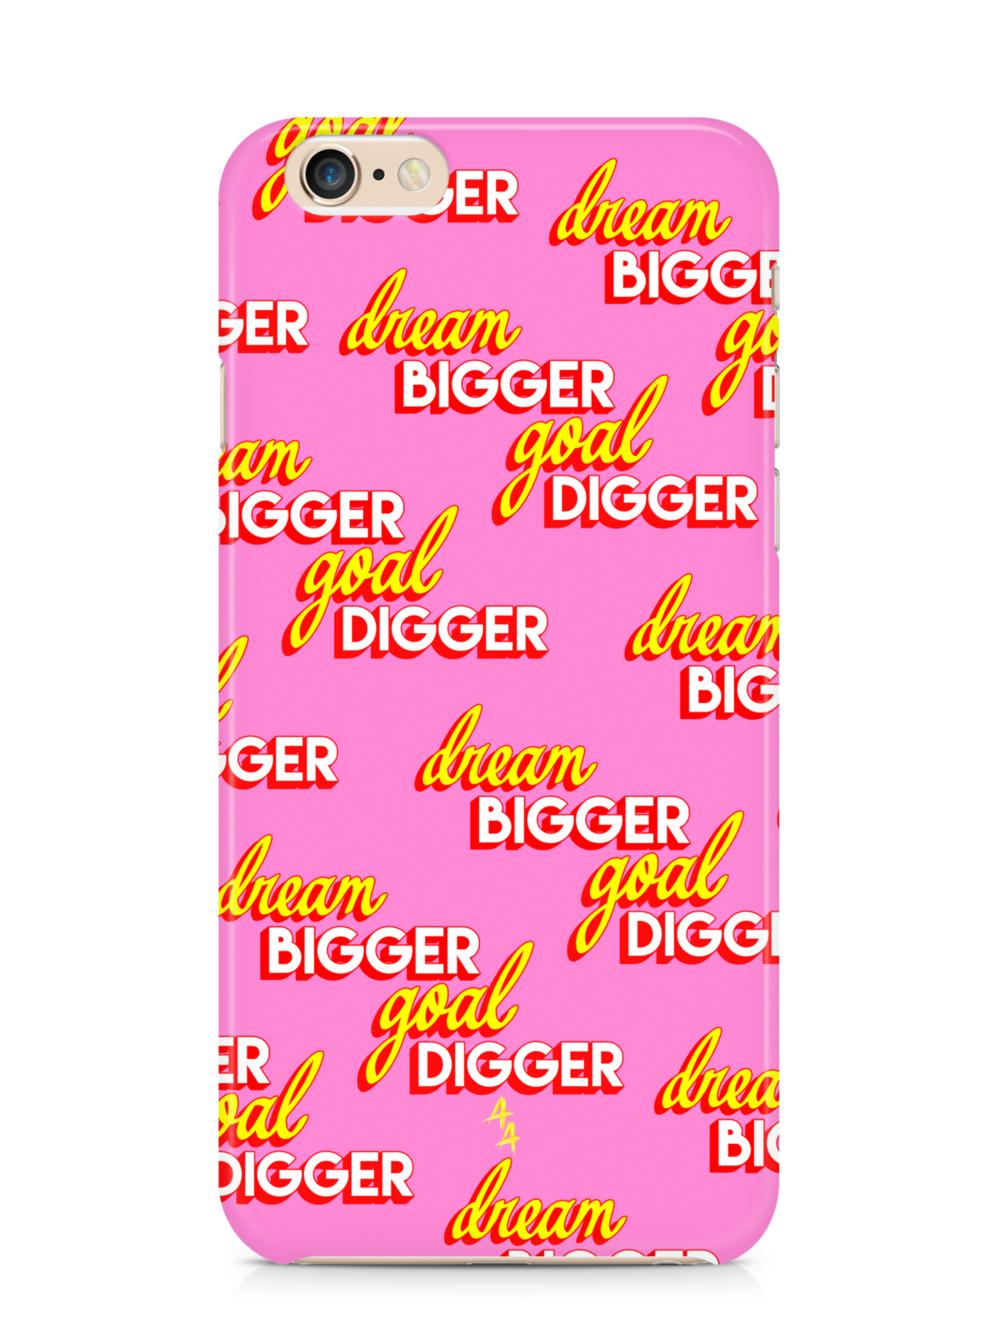 DREAM BIGGER GOAL DIGGER | £25.00 GBP